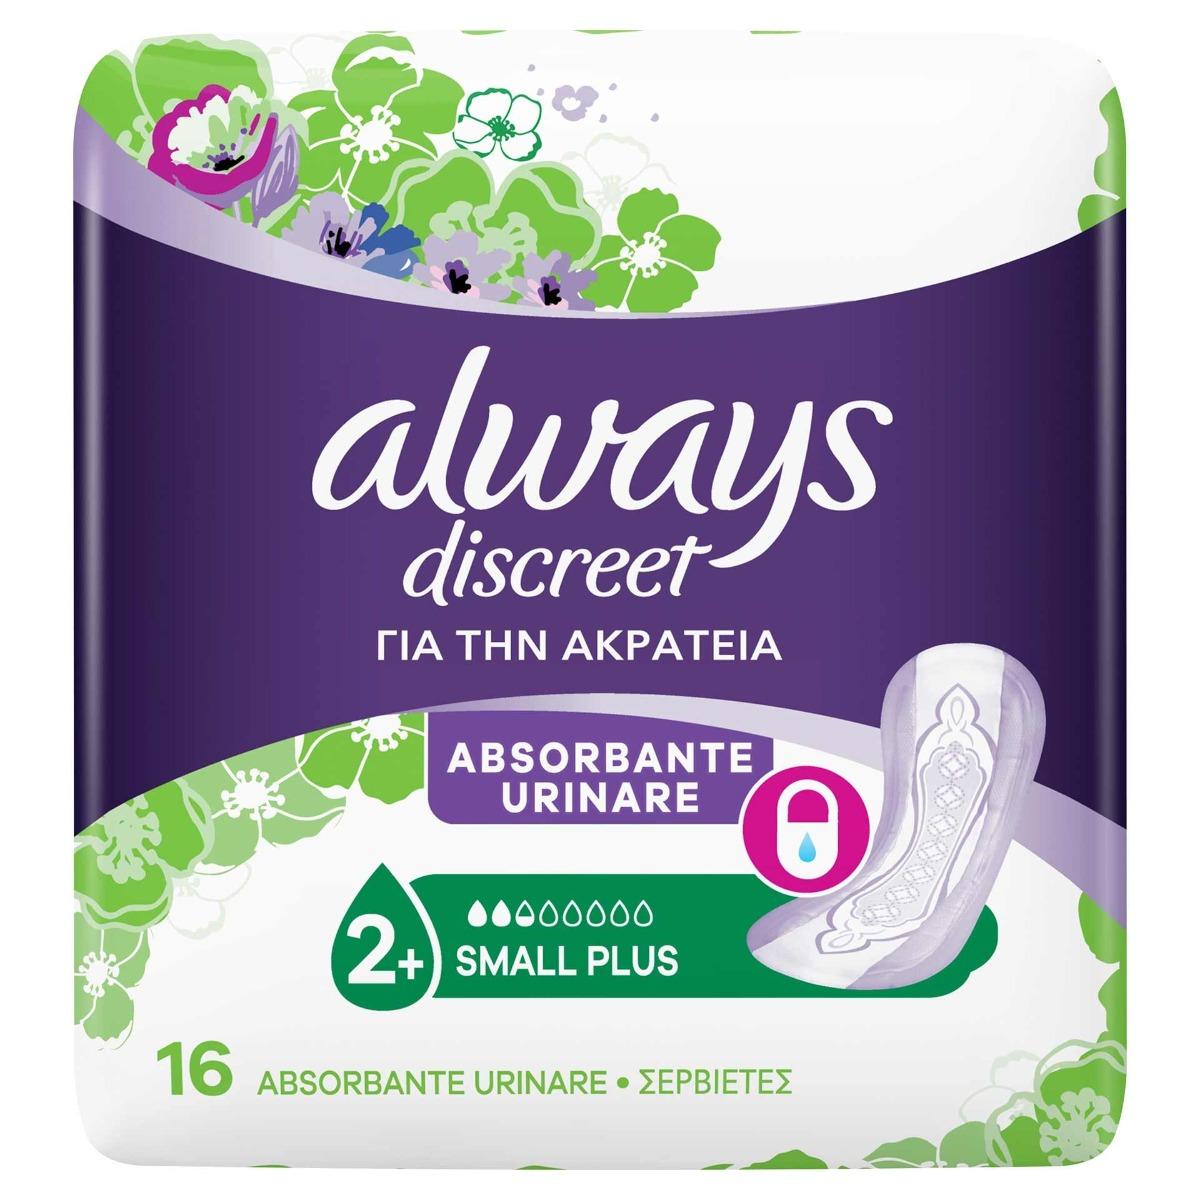 Absorbante pentru incontinenta urinara Discreet Pads Small+, 16 bucati, Always drmax poza